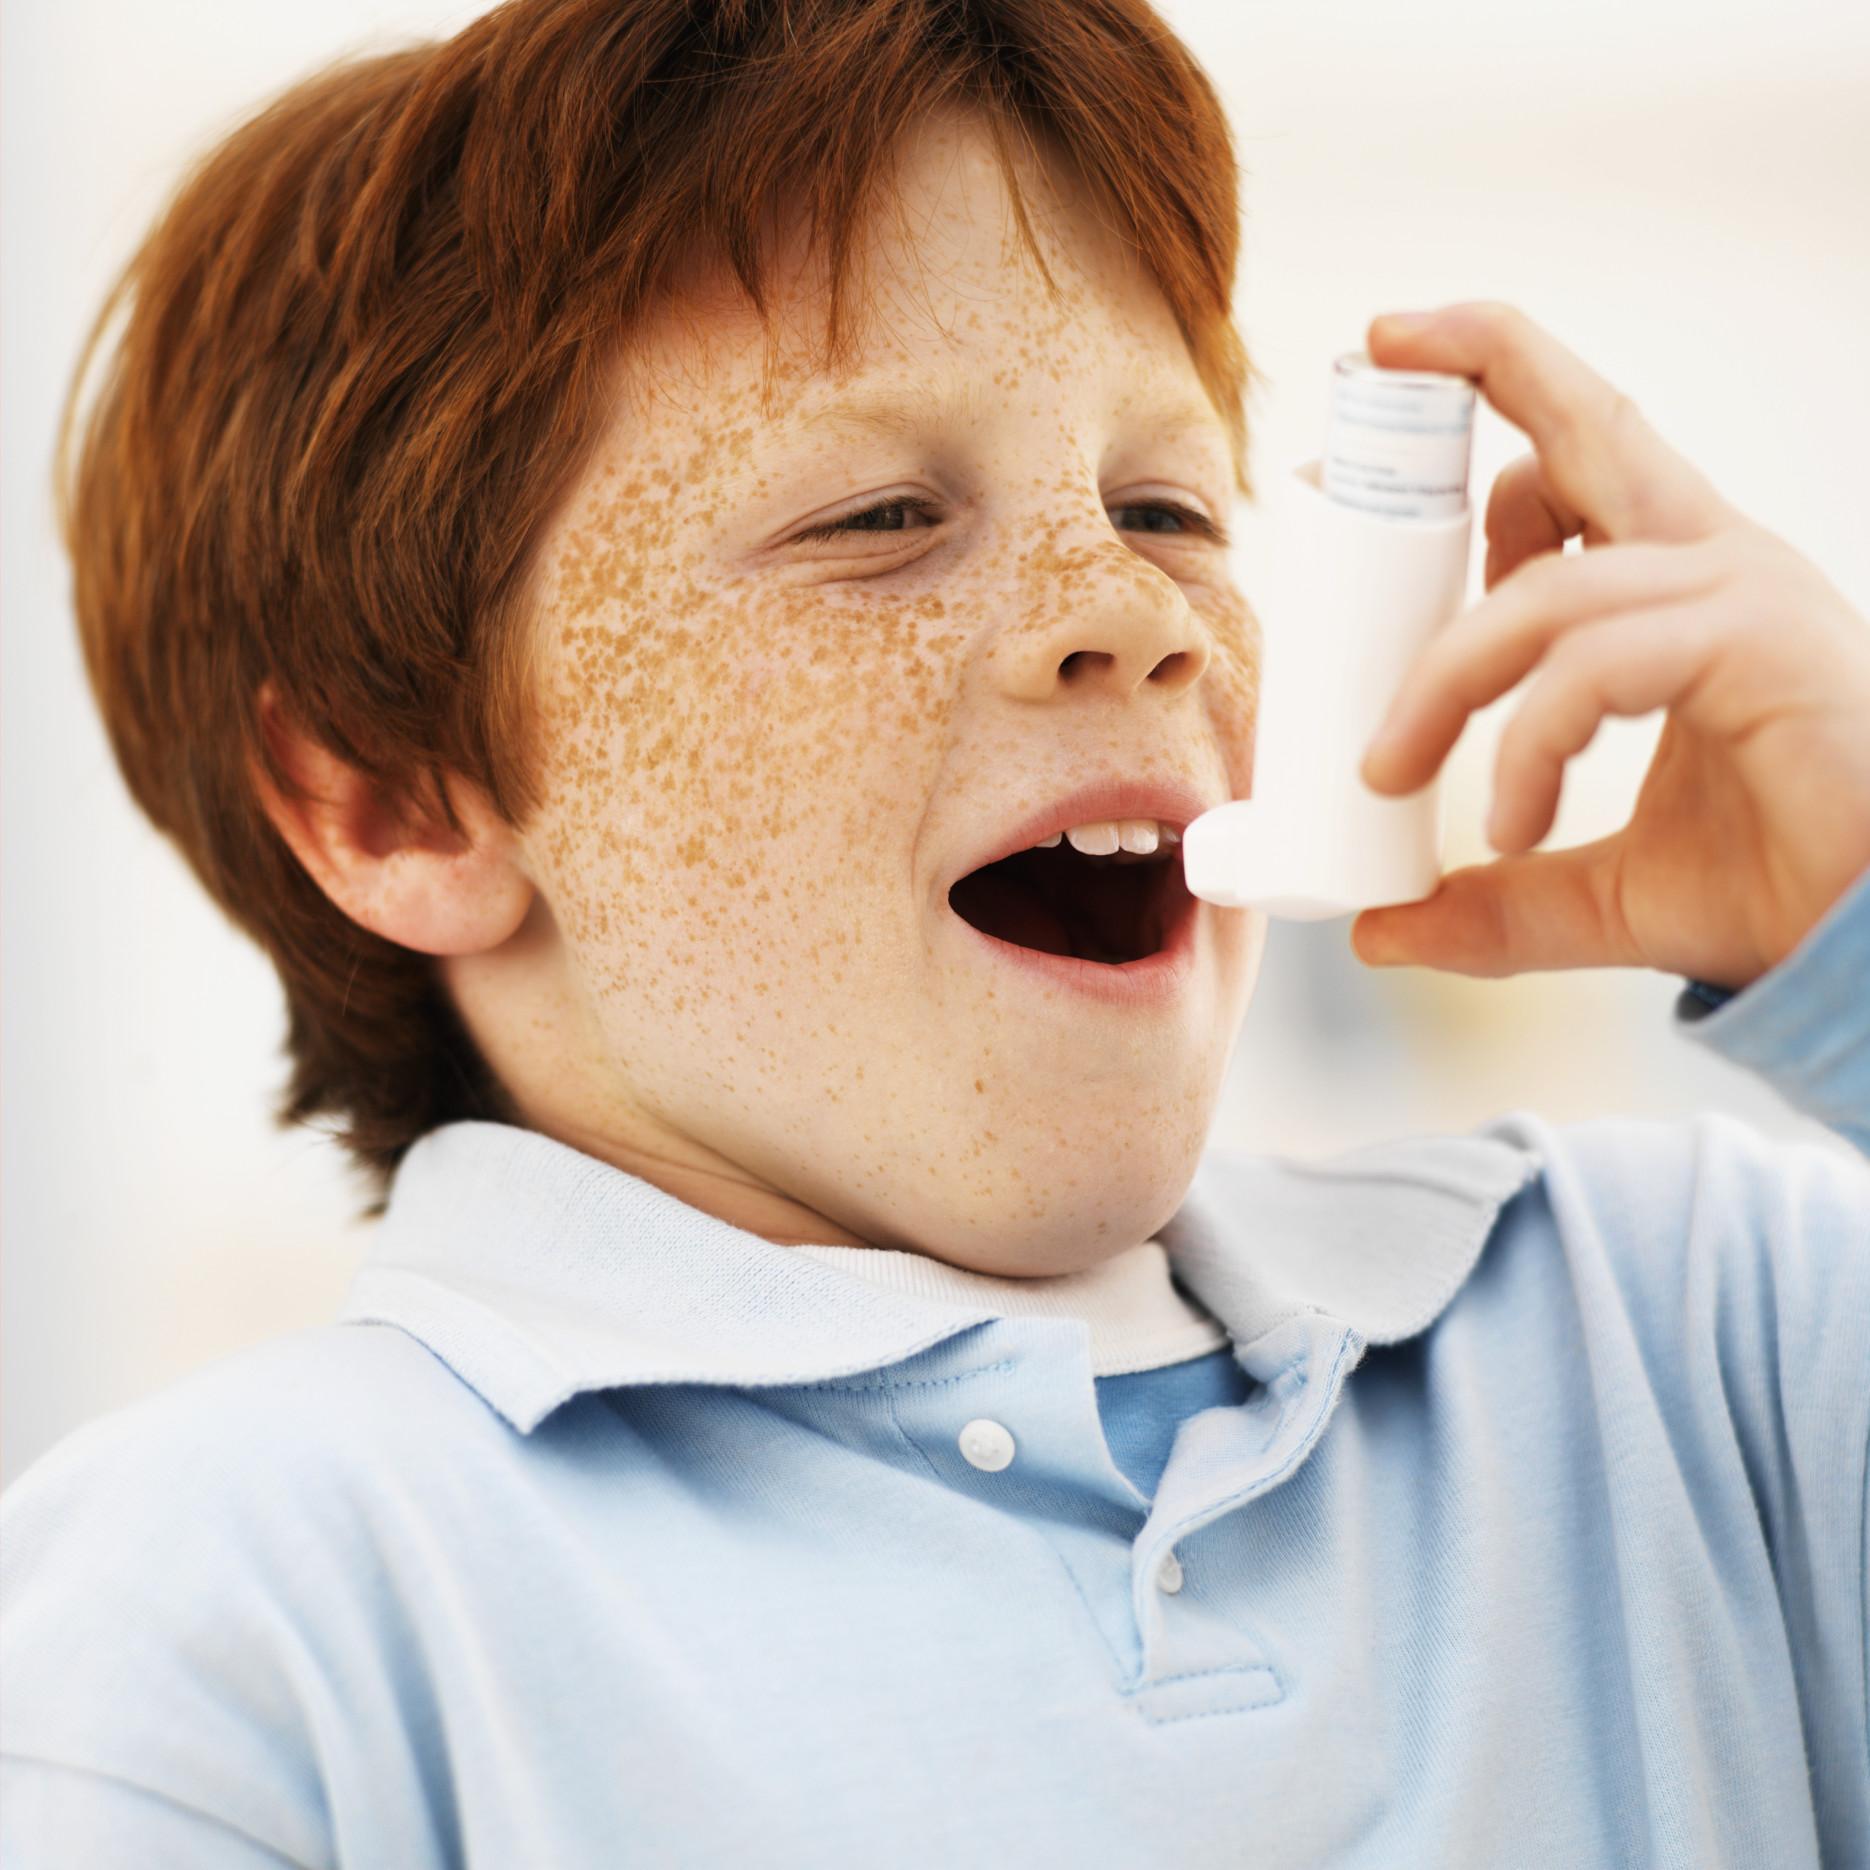 Asma nos Pequenos? Aprenda a Controlá-la